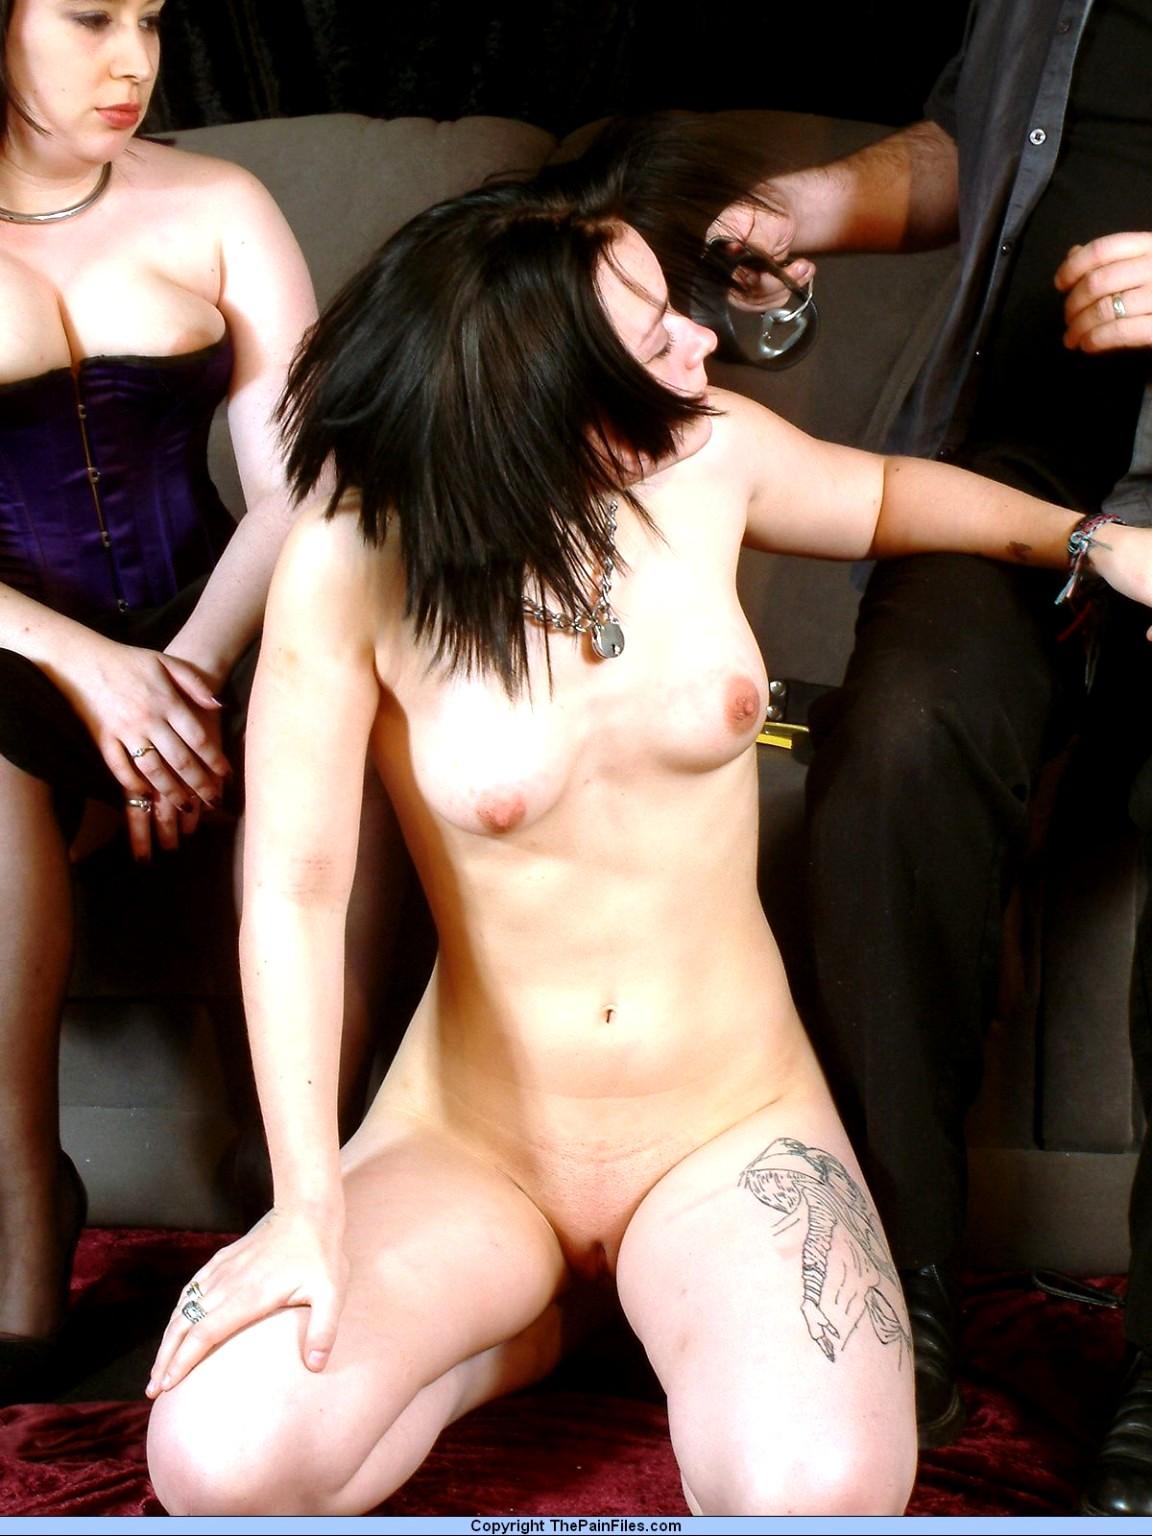 Amator camera gizli sex turk